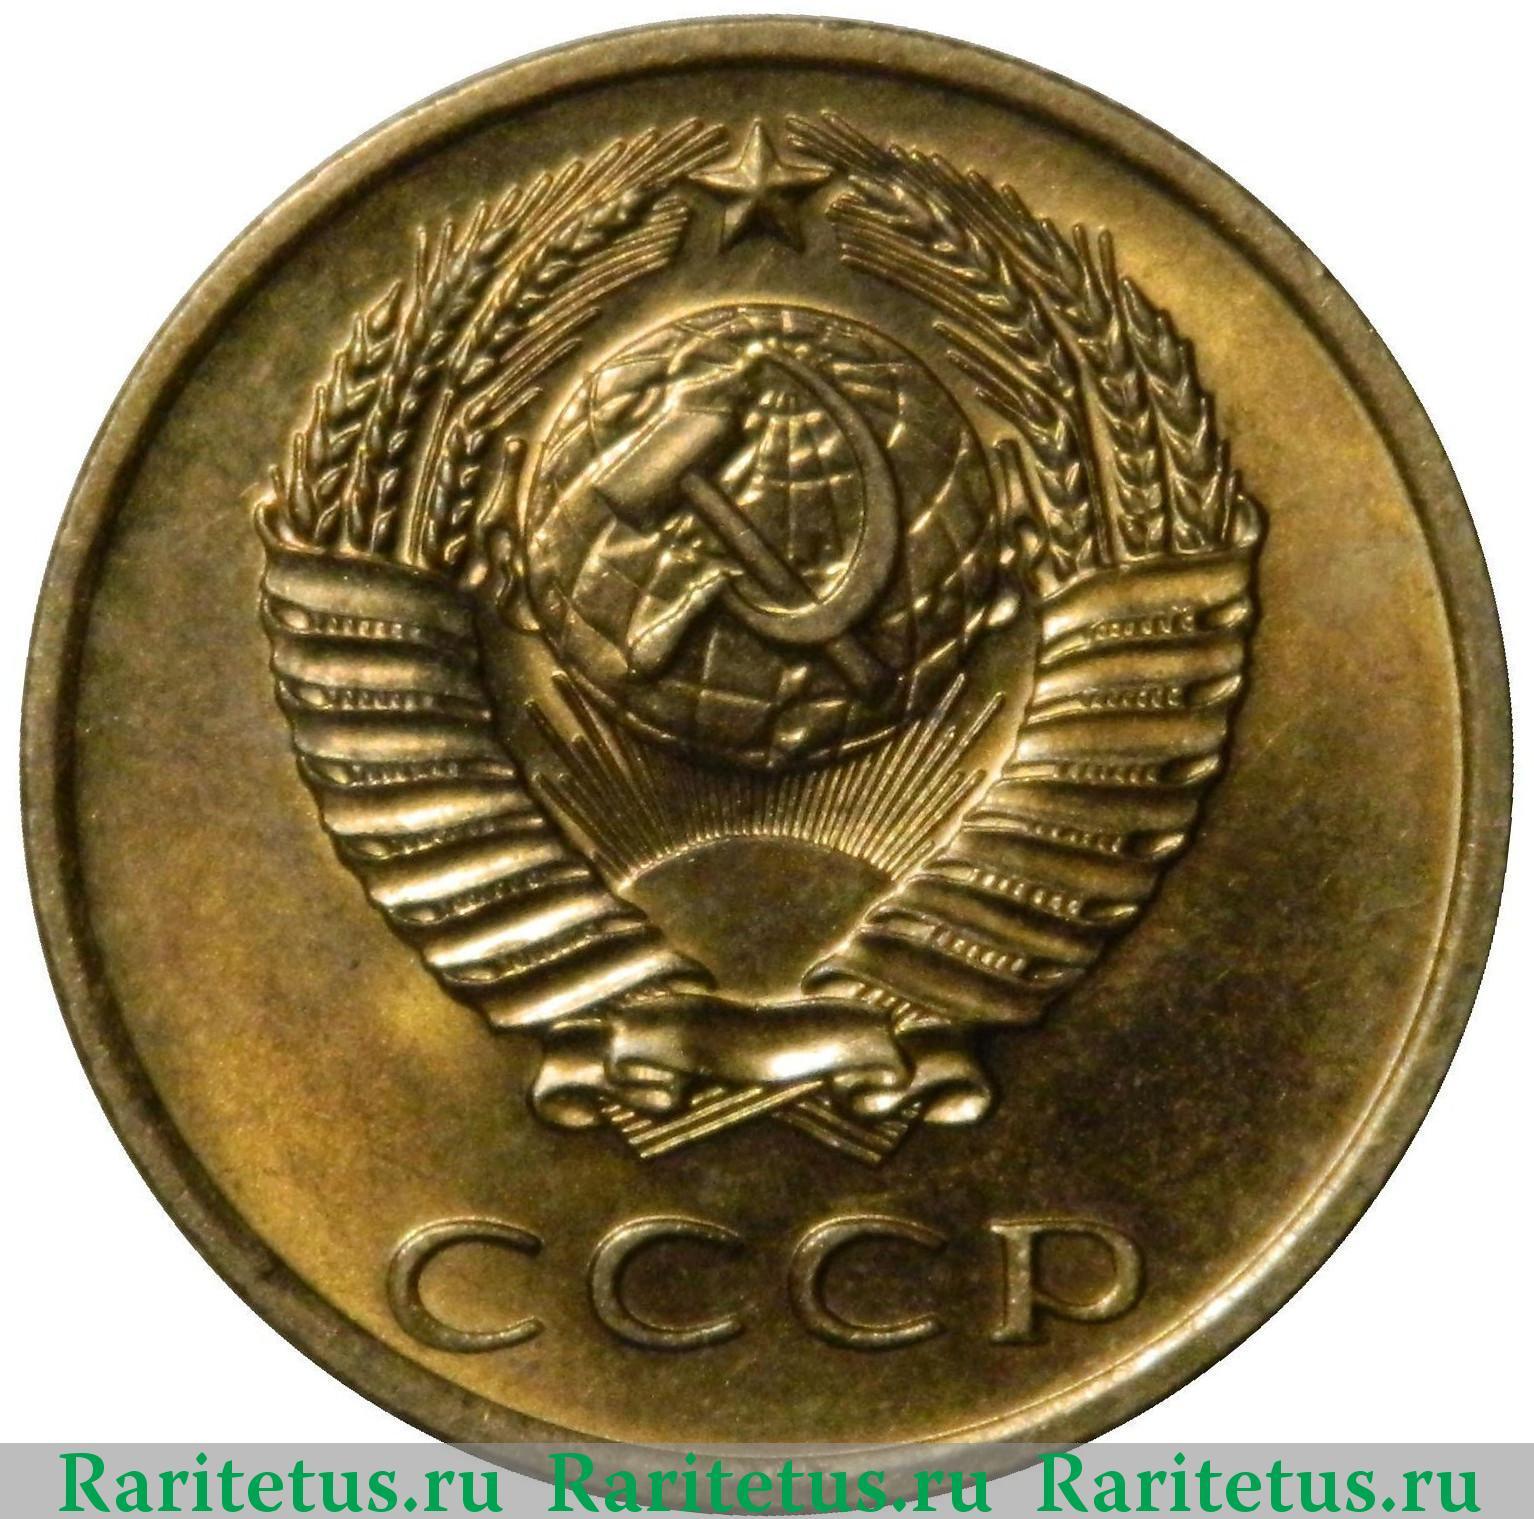 3 коп 1970 года цена 1 польская злота 1995года цена